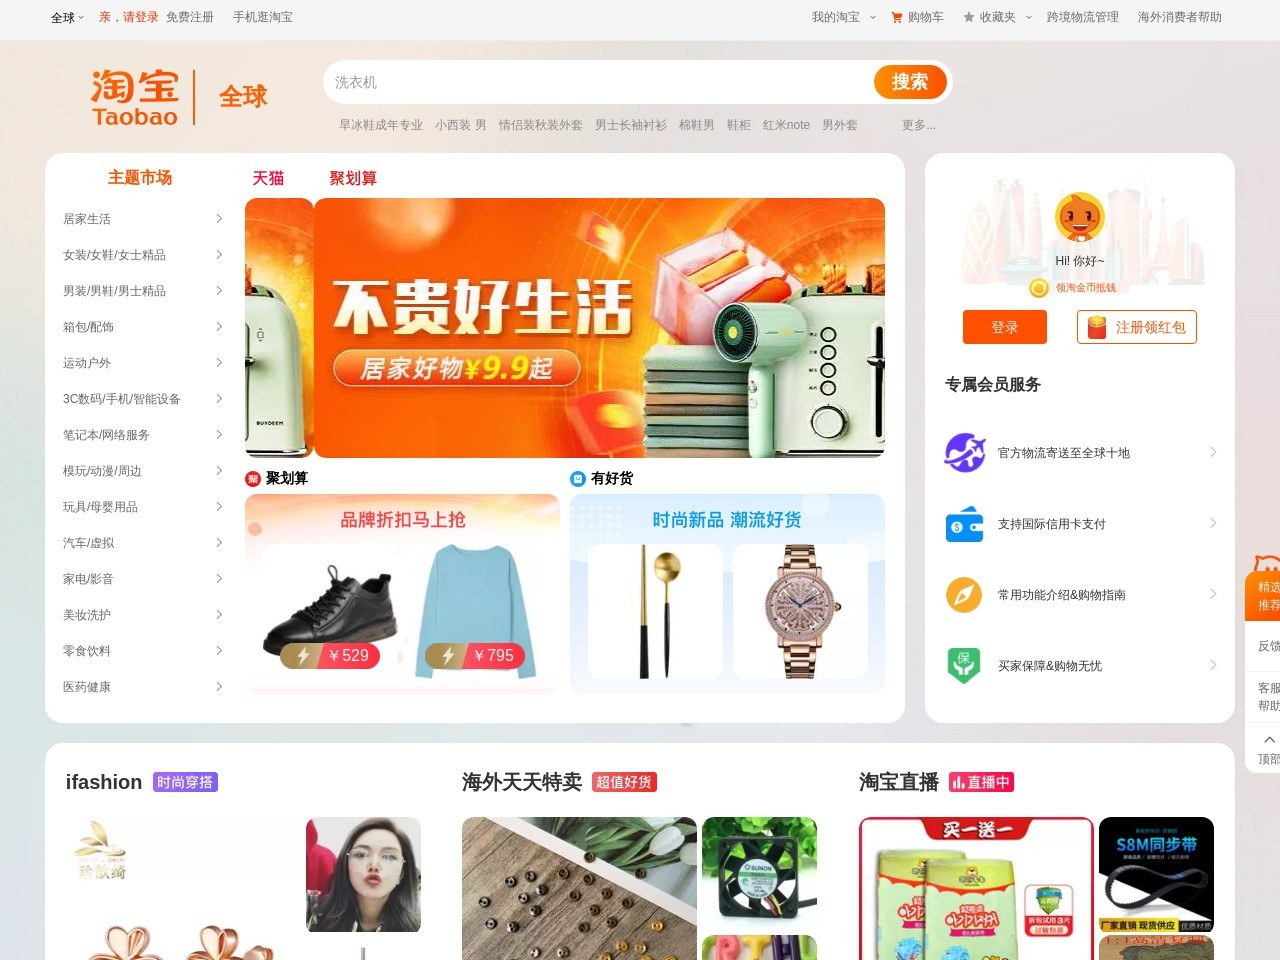 Webthumbnail taobao.com